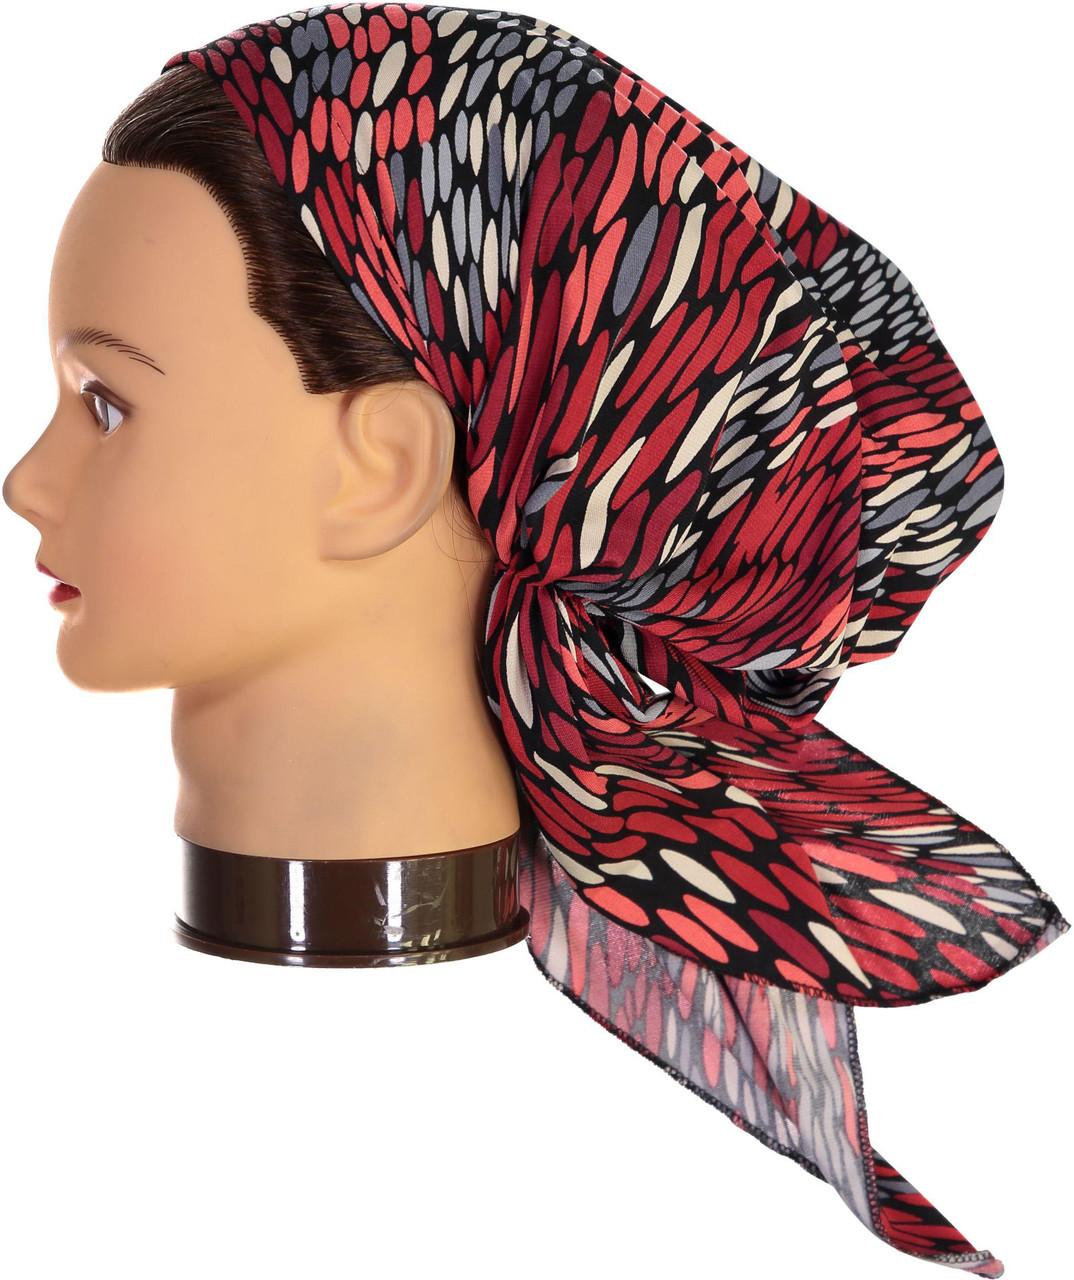 Riqki Womens Red Feather Pre-Tied Bandana - PTBL1042